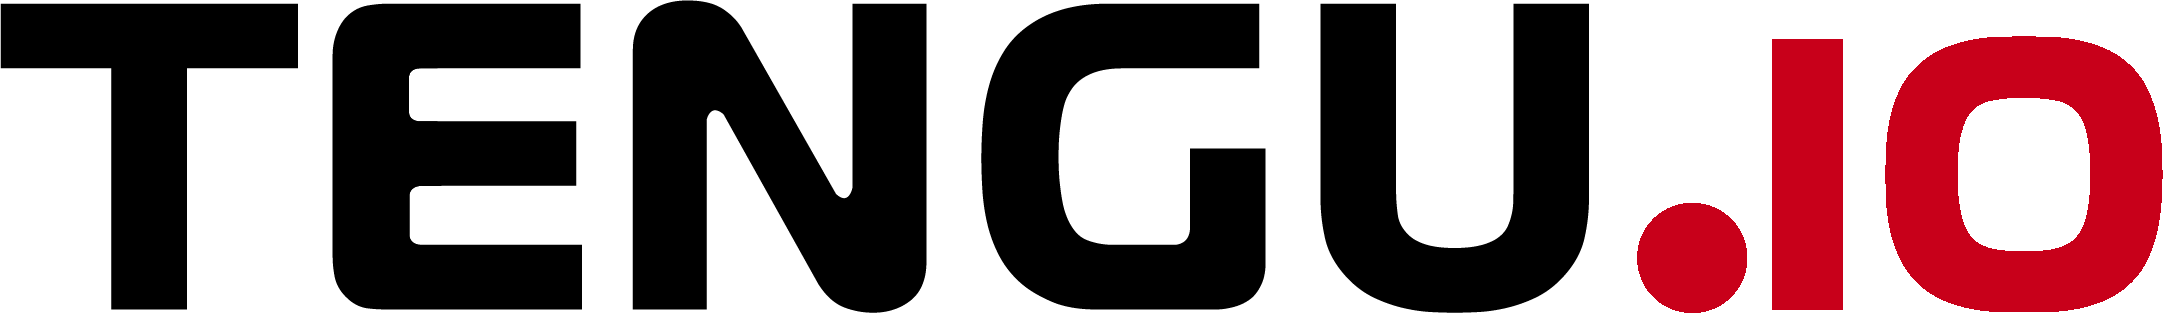 Black version Transparant background(IO) (1) (1).png